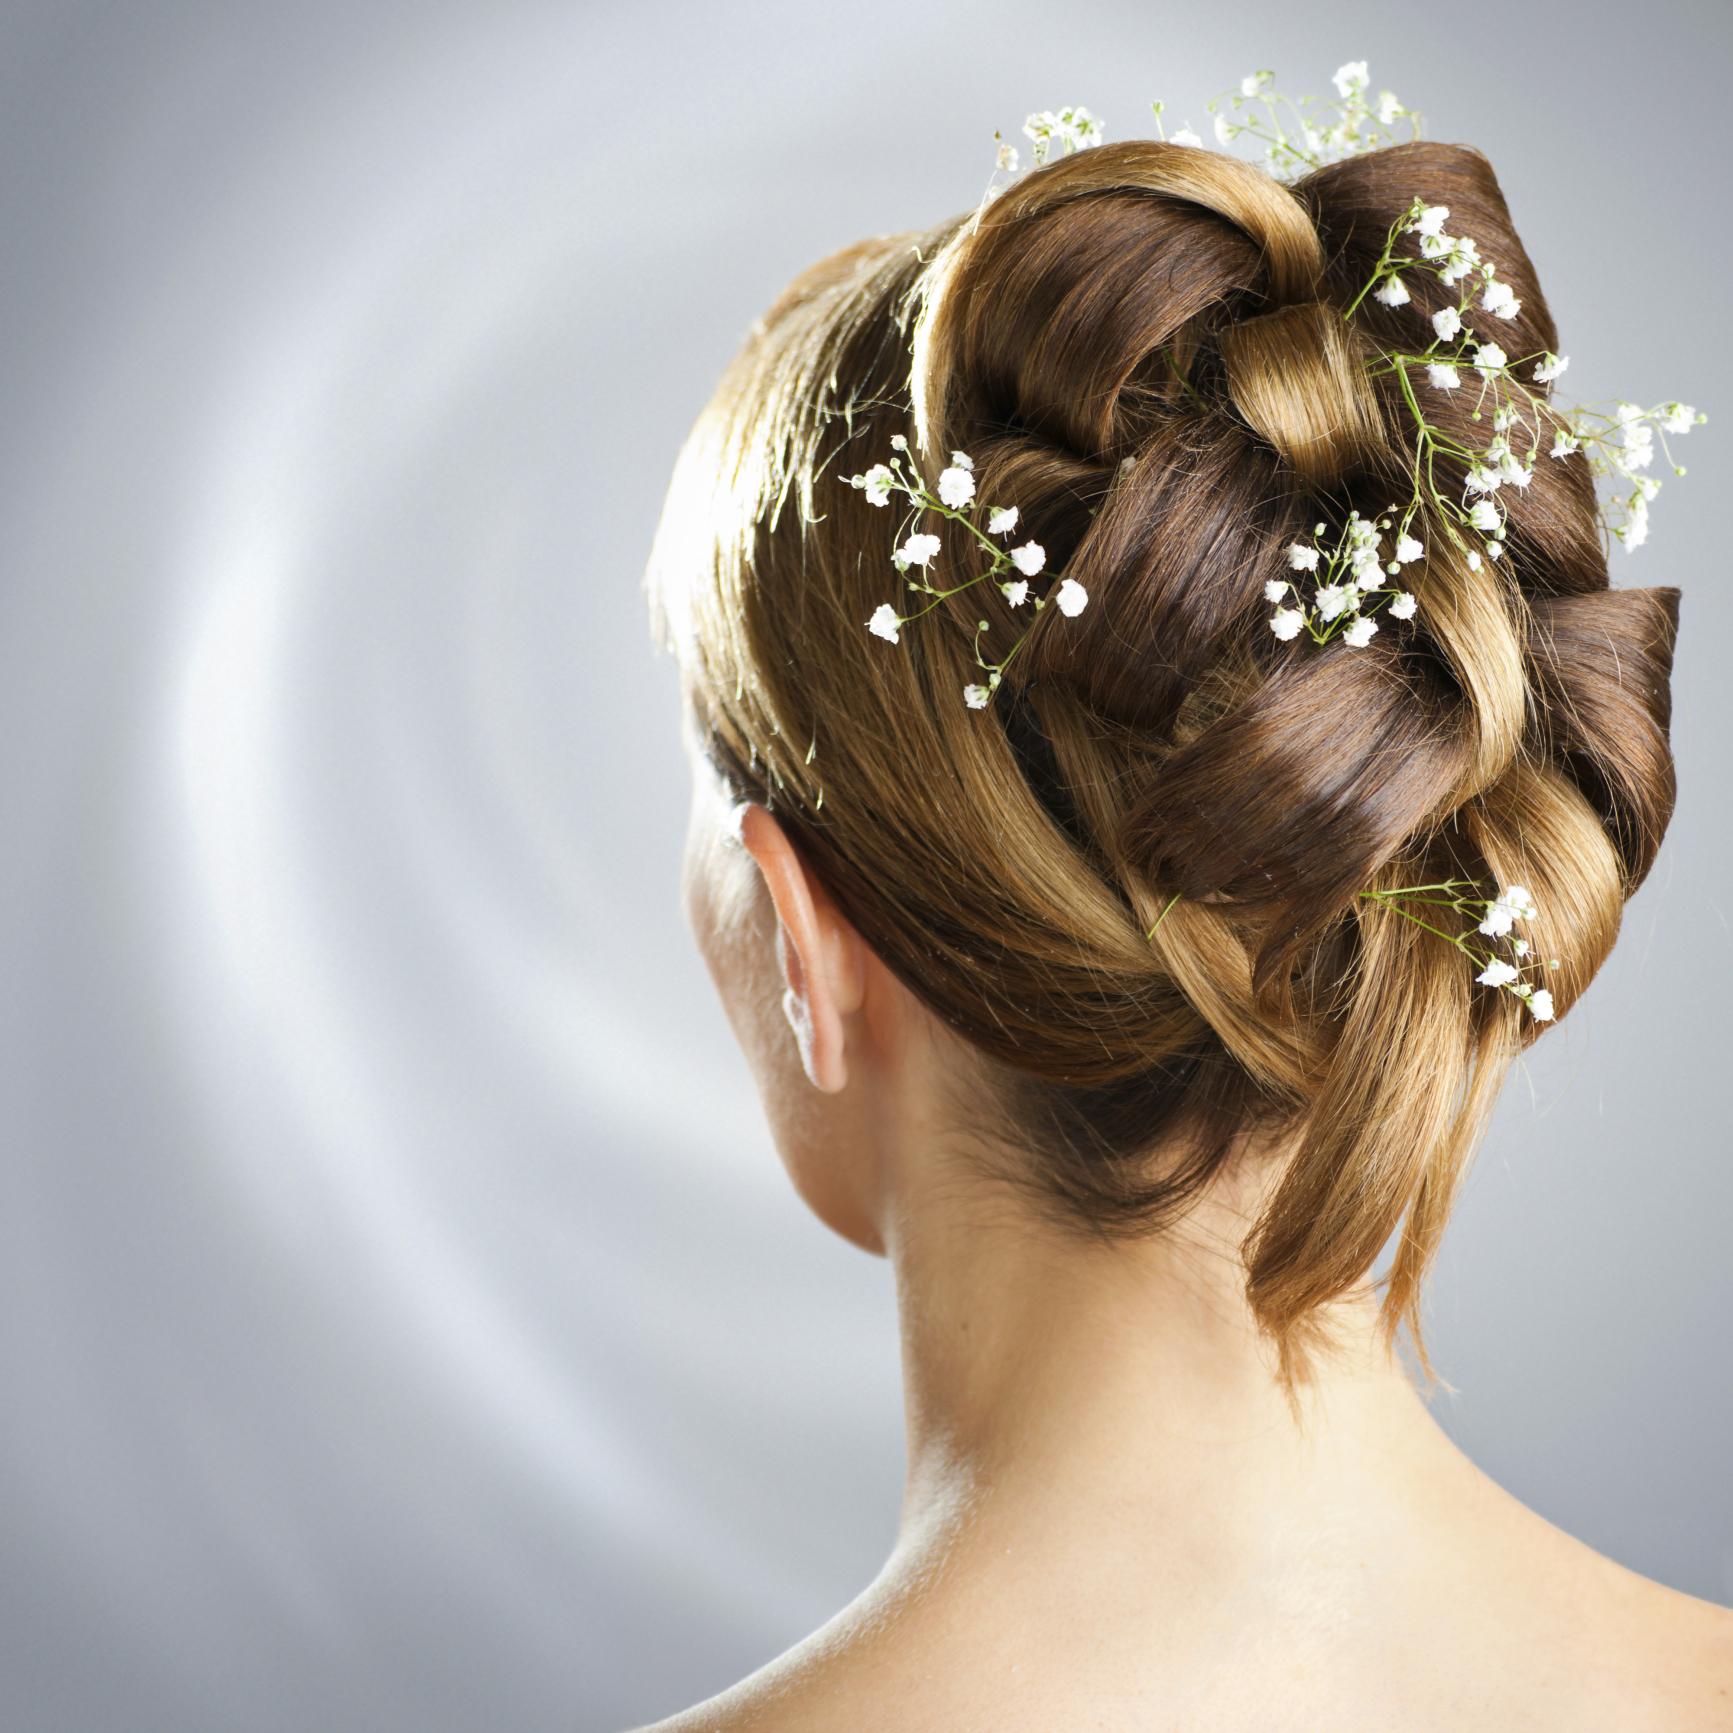 Modern Wedding Hairstyles: Modern Bridal Hair Styles